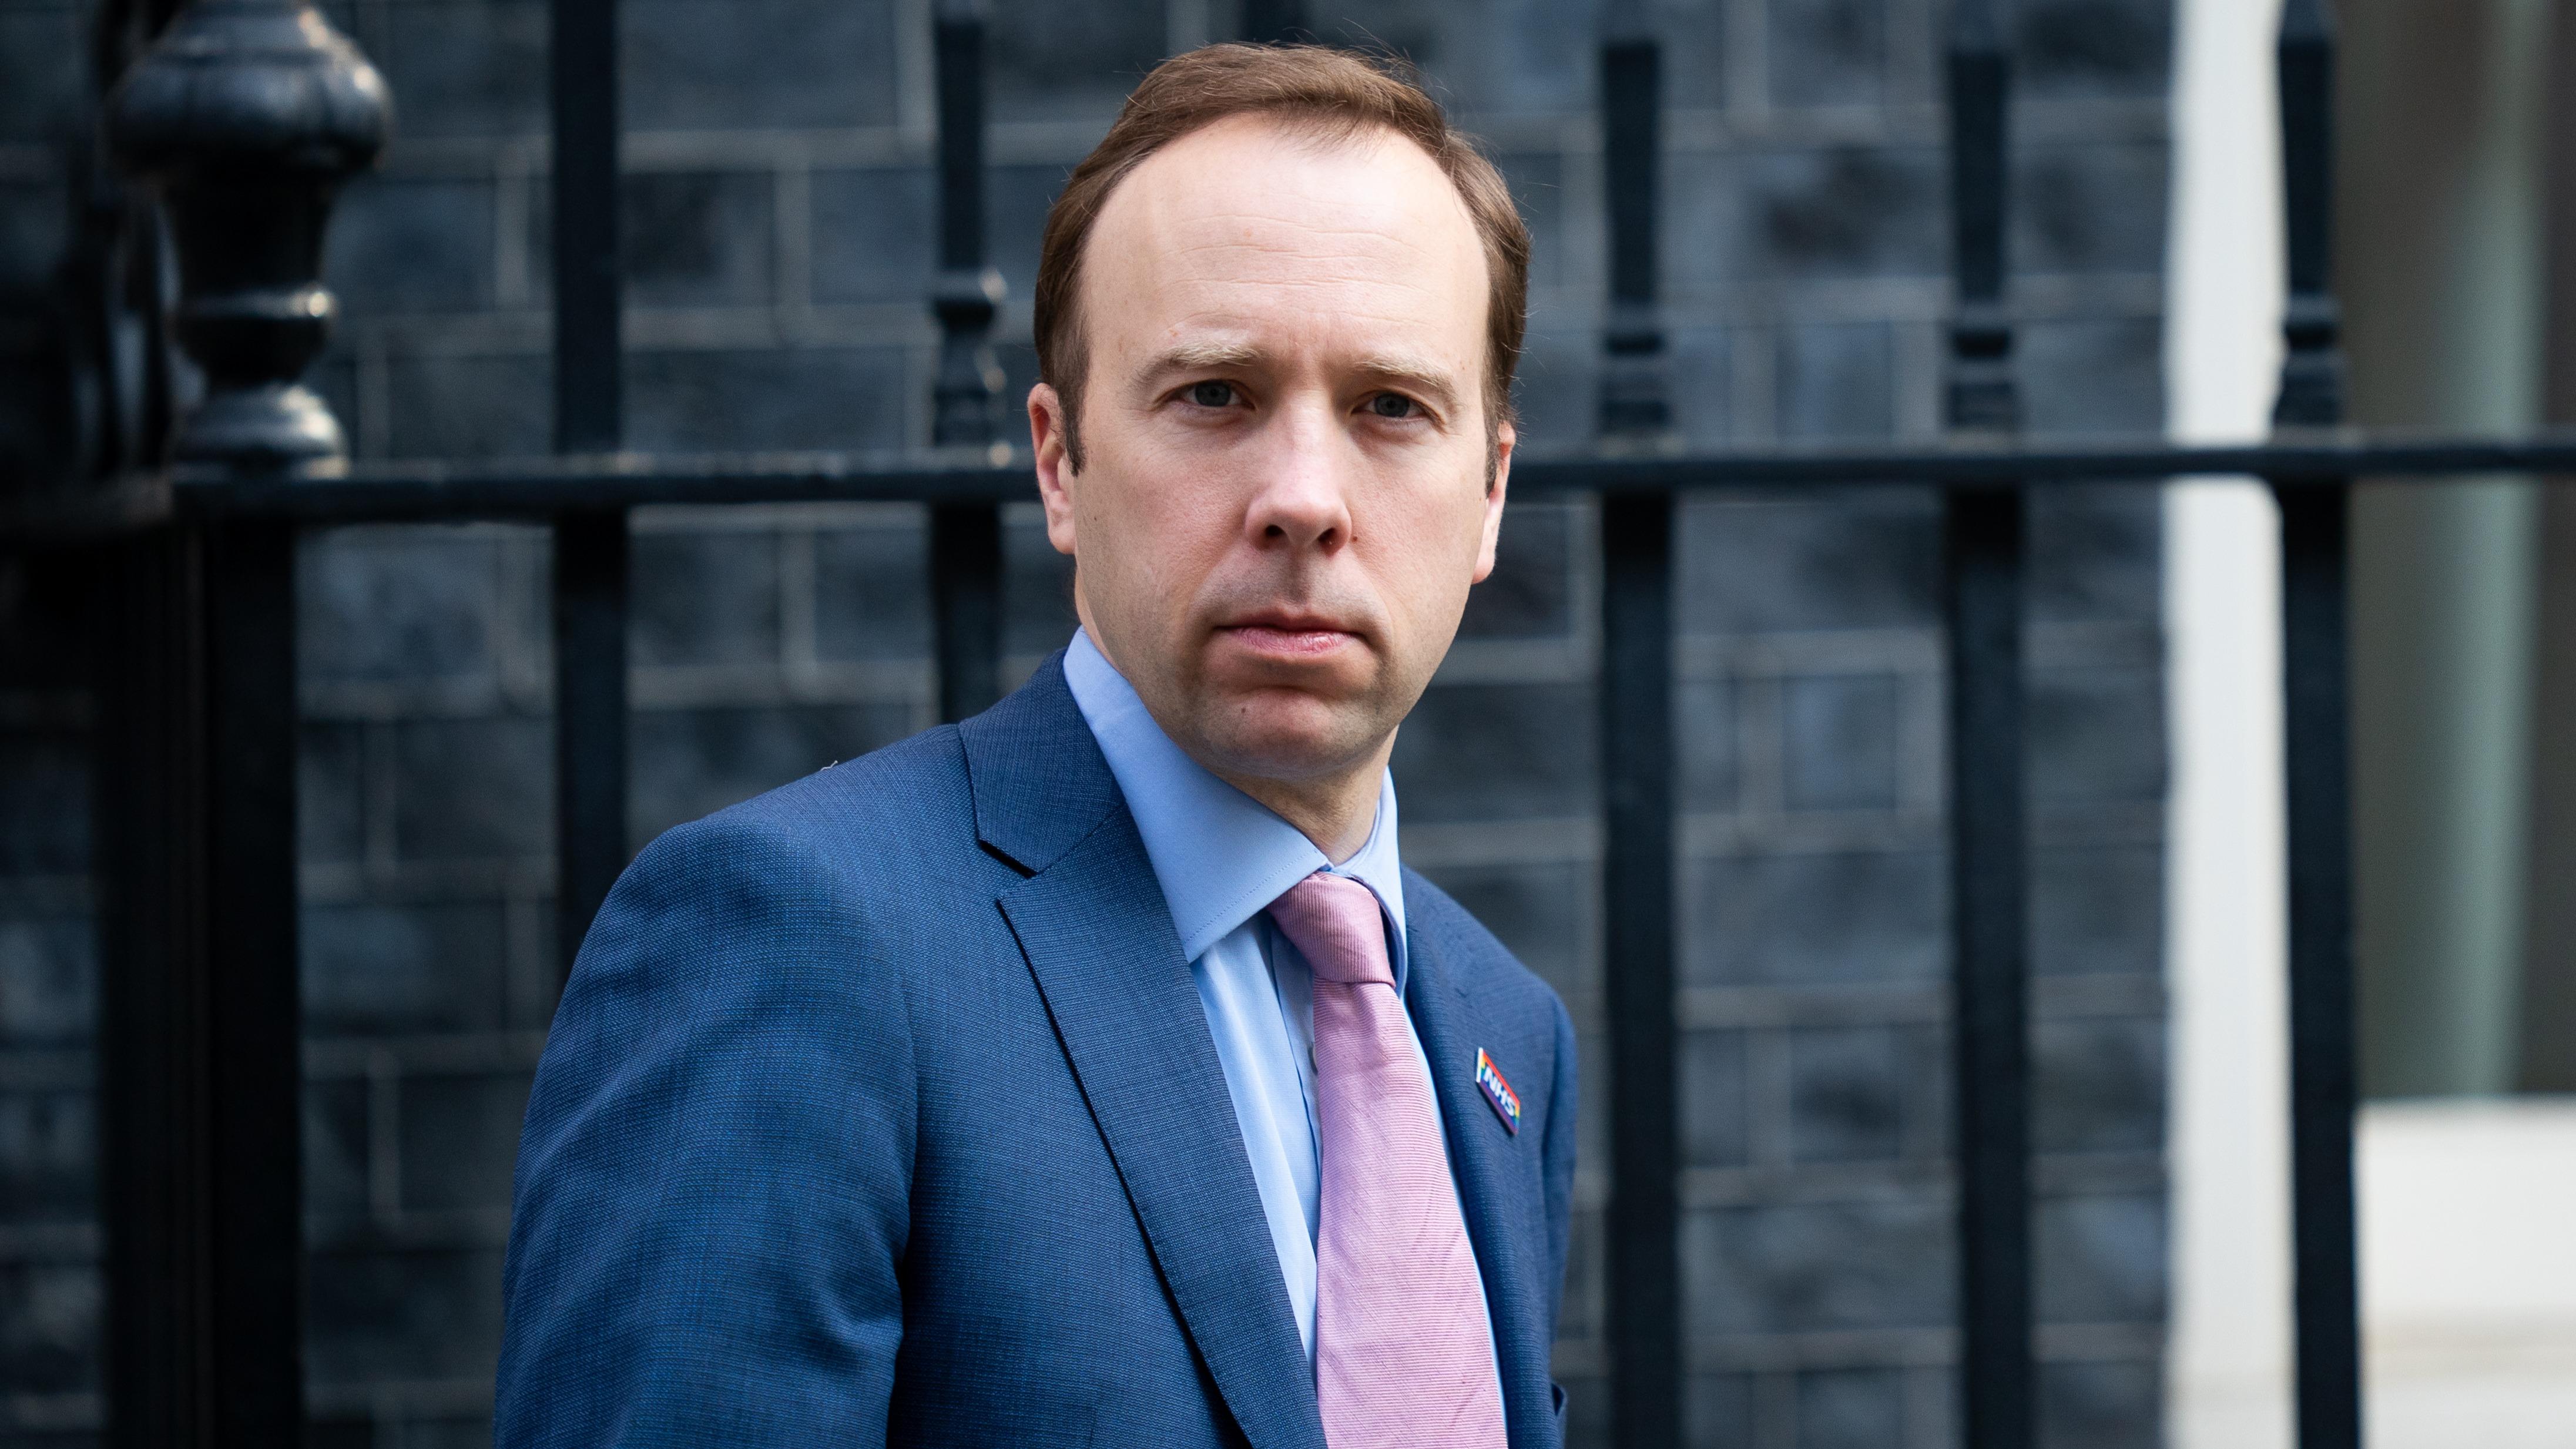 Former Health Secretary and West Suffolk MP Matt Hancock given job as UN  special envoy in Africa